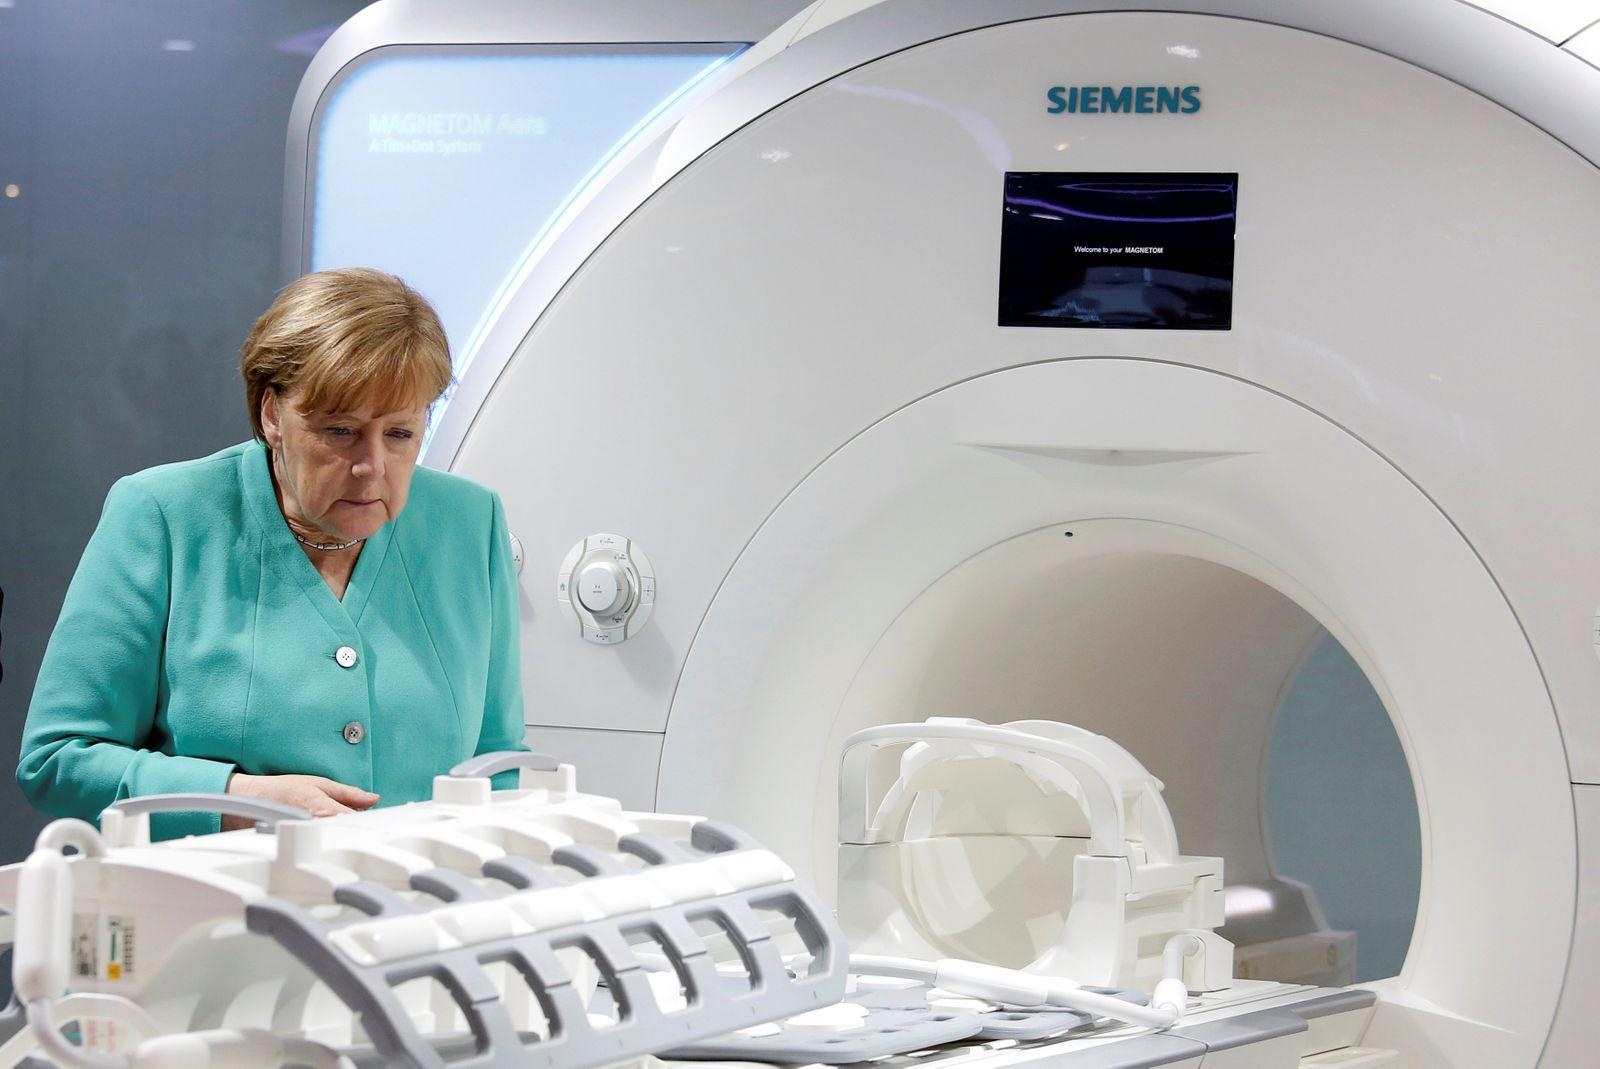 FILE PHOTO: German Chancellor Angela Merkel checks a magnetic resonance imaging machine as she visits Siemens Healthineers in Shenzhen